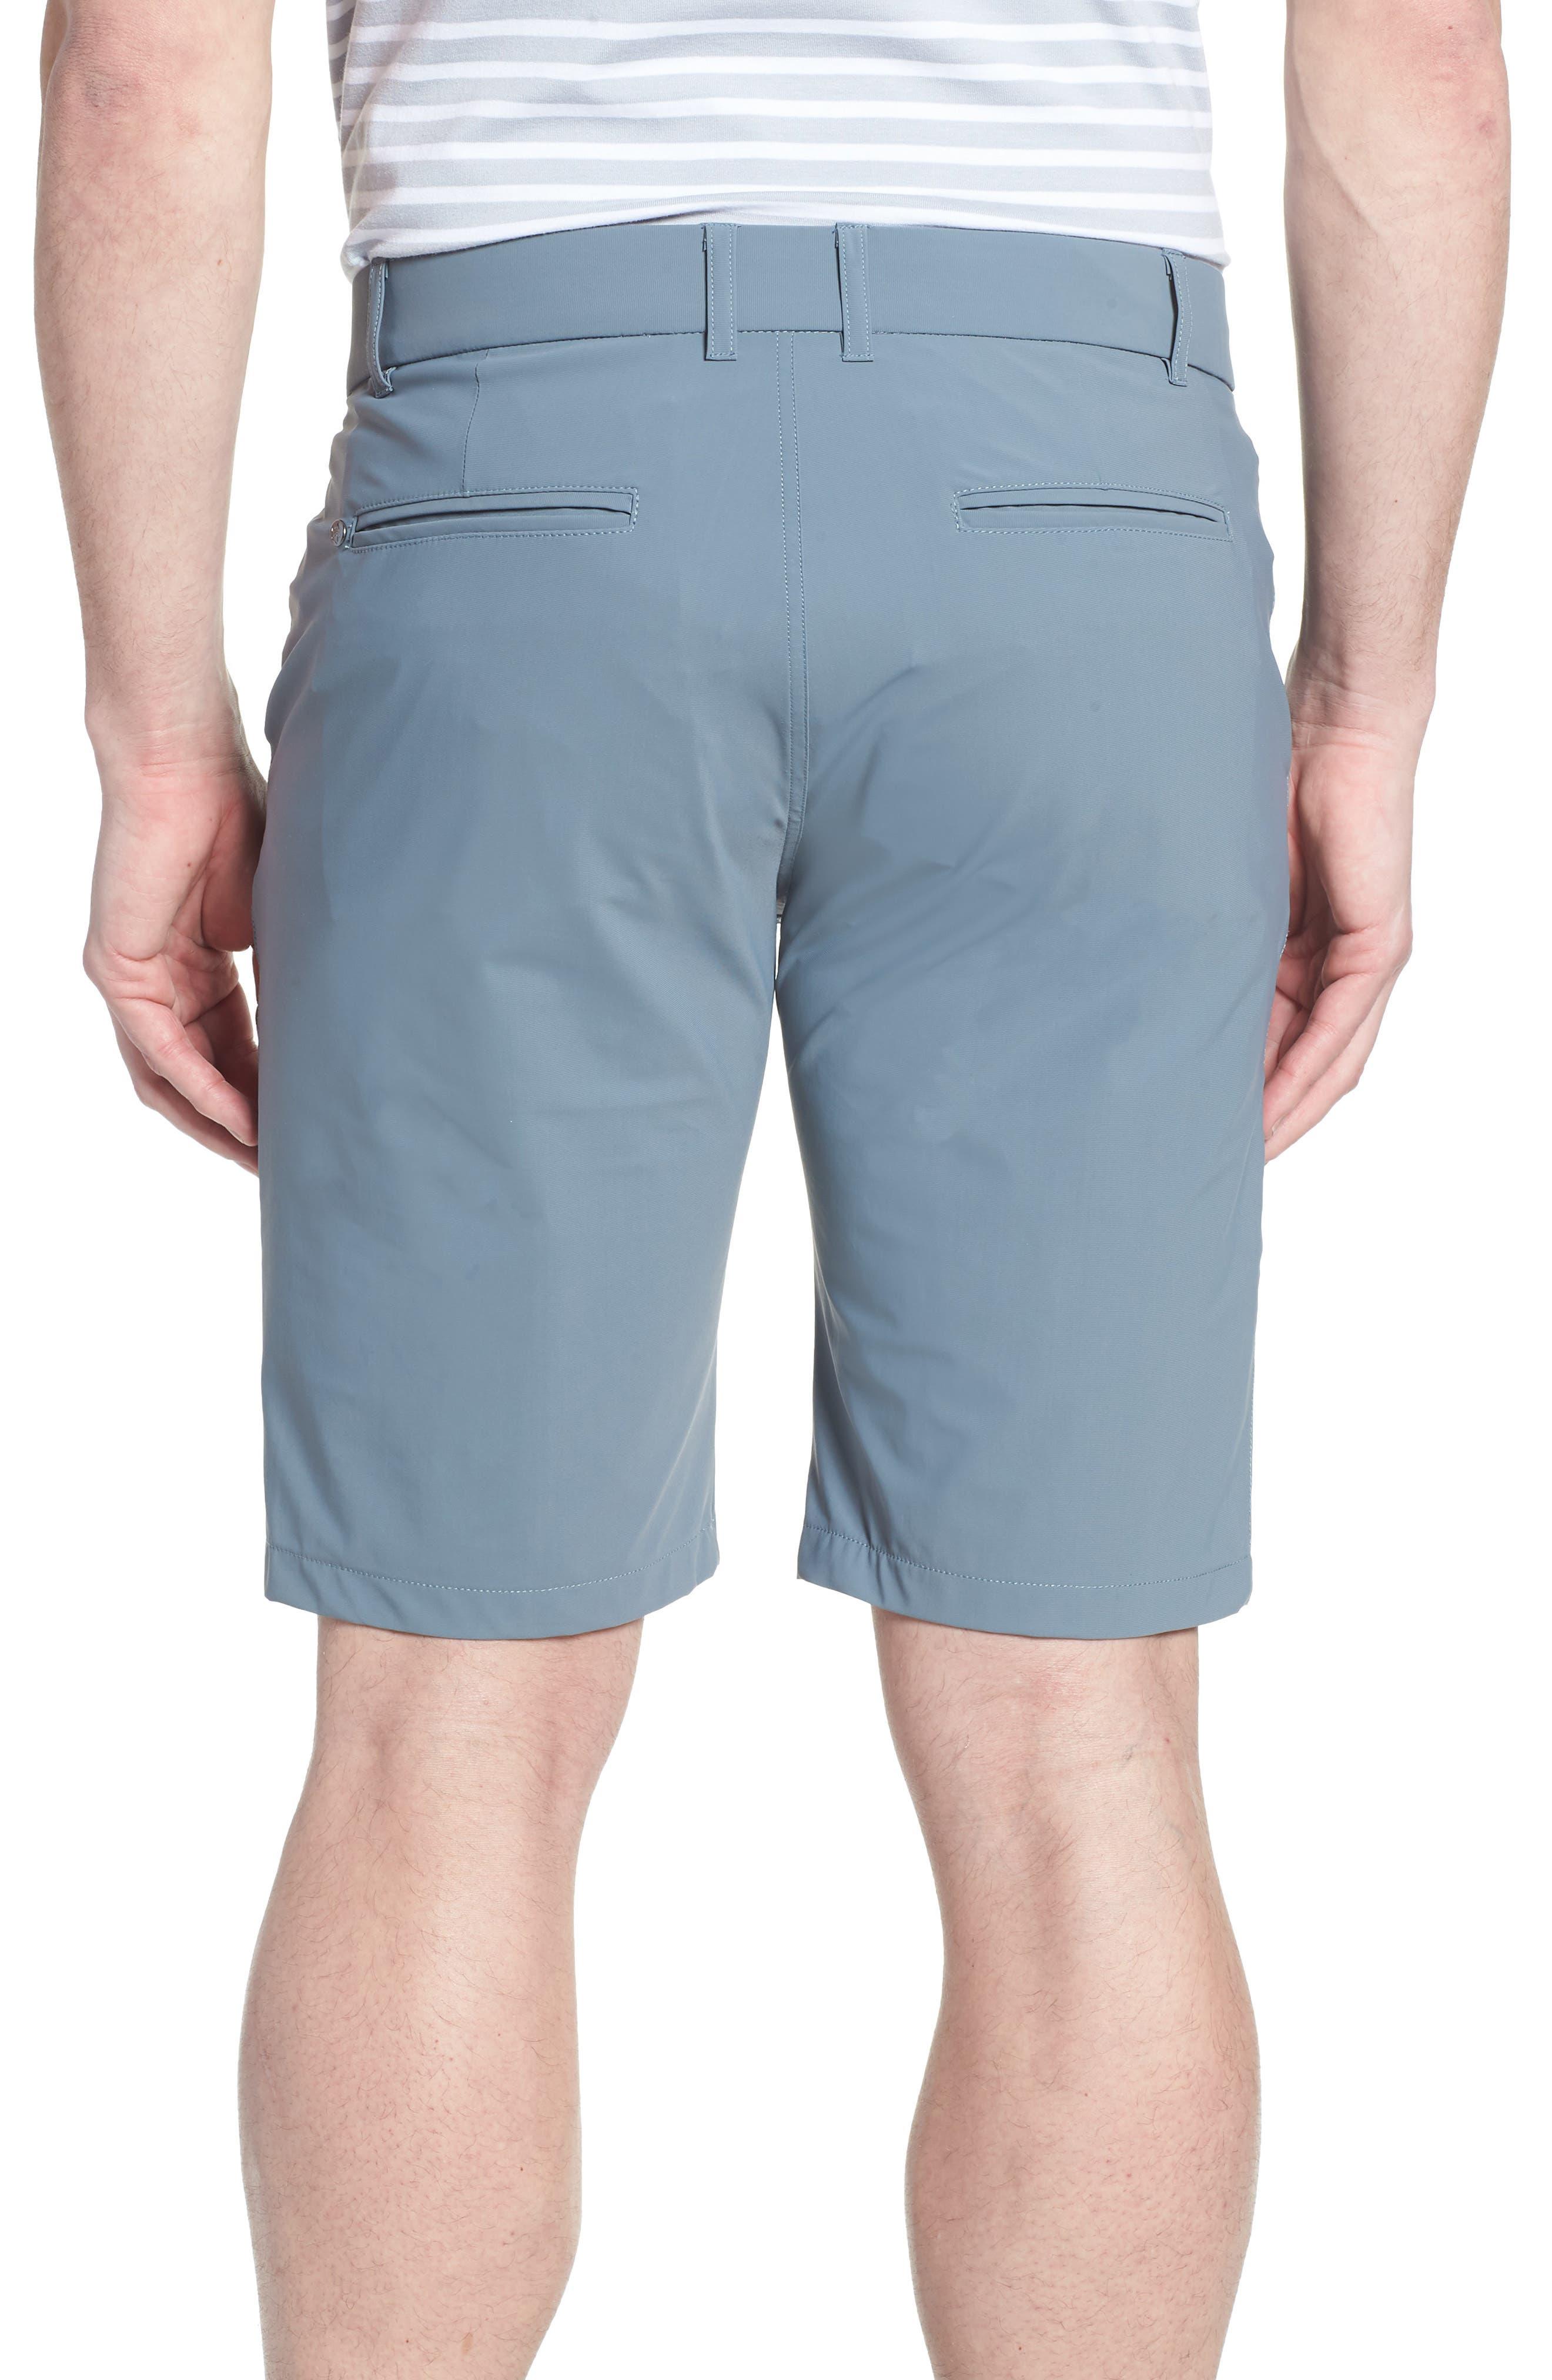 Montauk Shorts,                             Alternate thumbnail 2, color,                             Slate